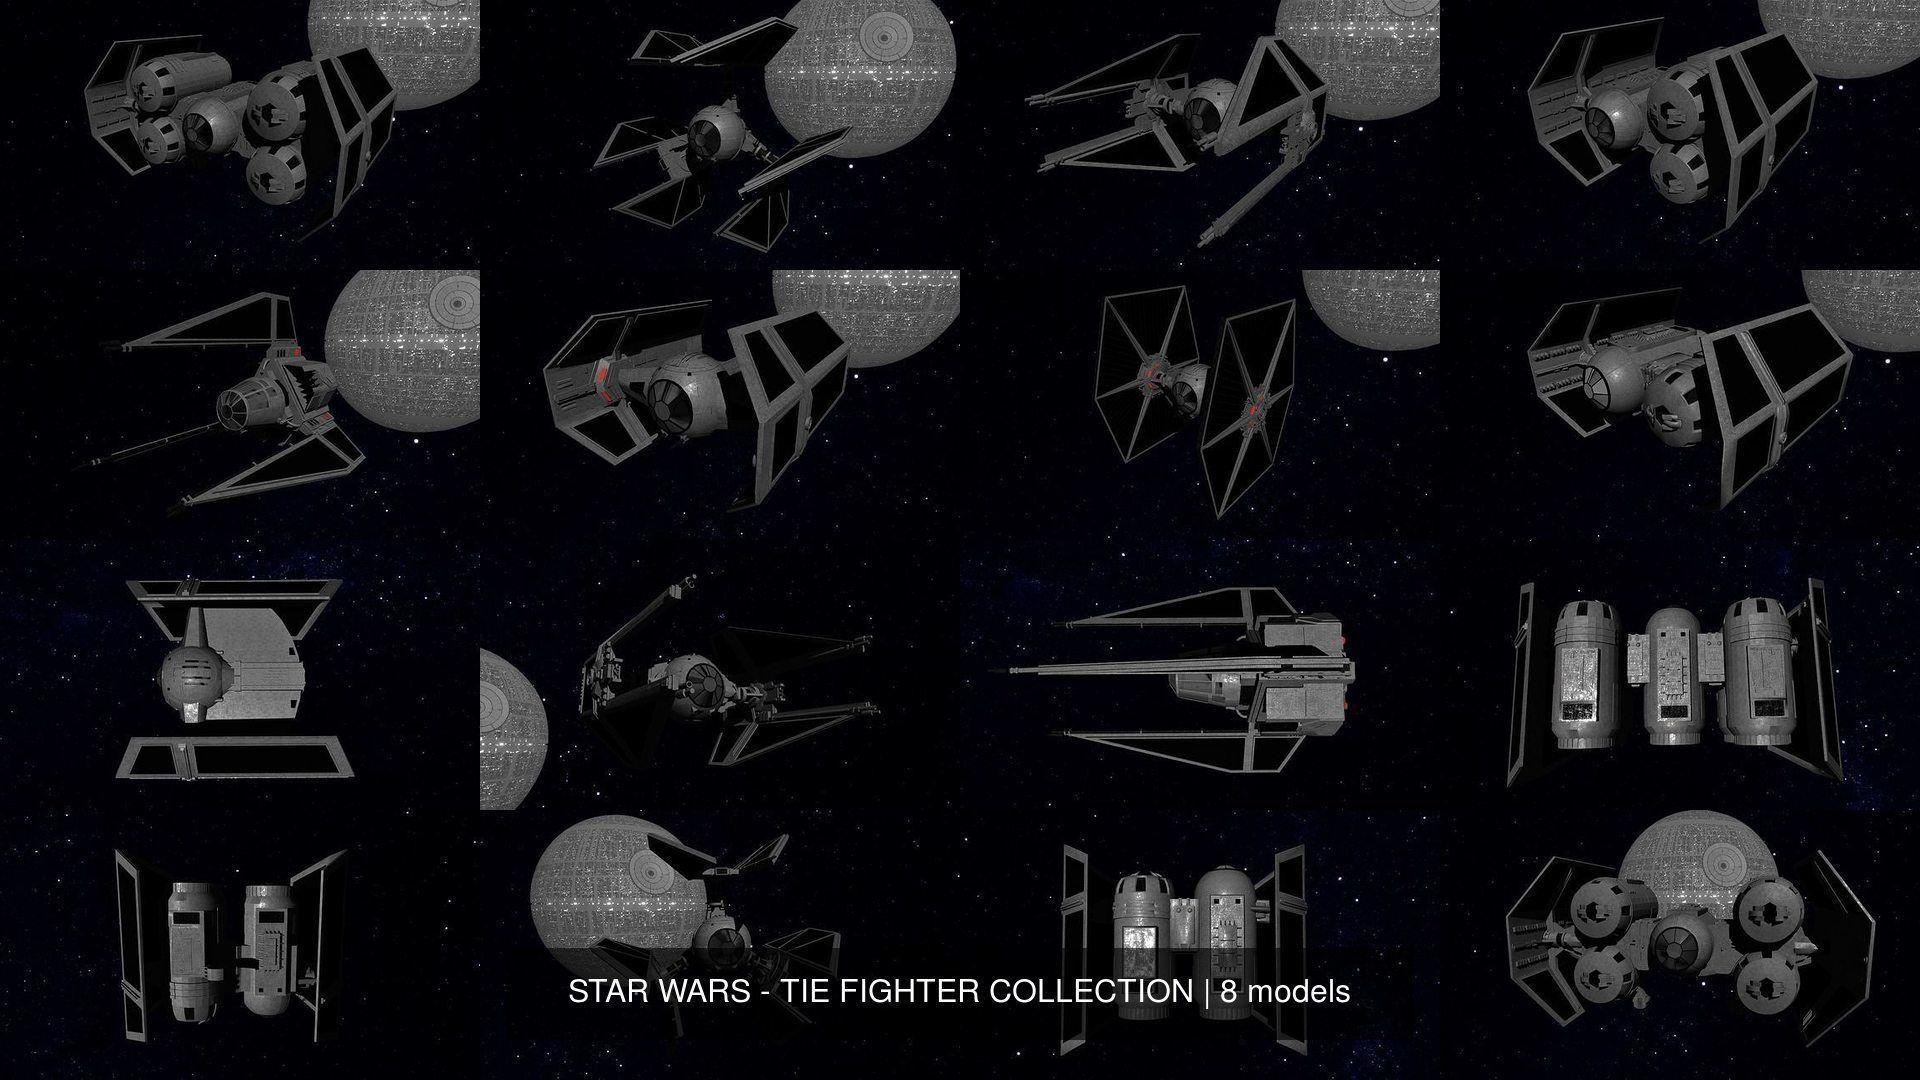 STAR WARS - TIE FIGHTER COLLECTION |